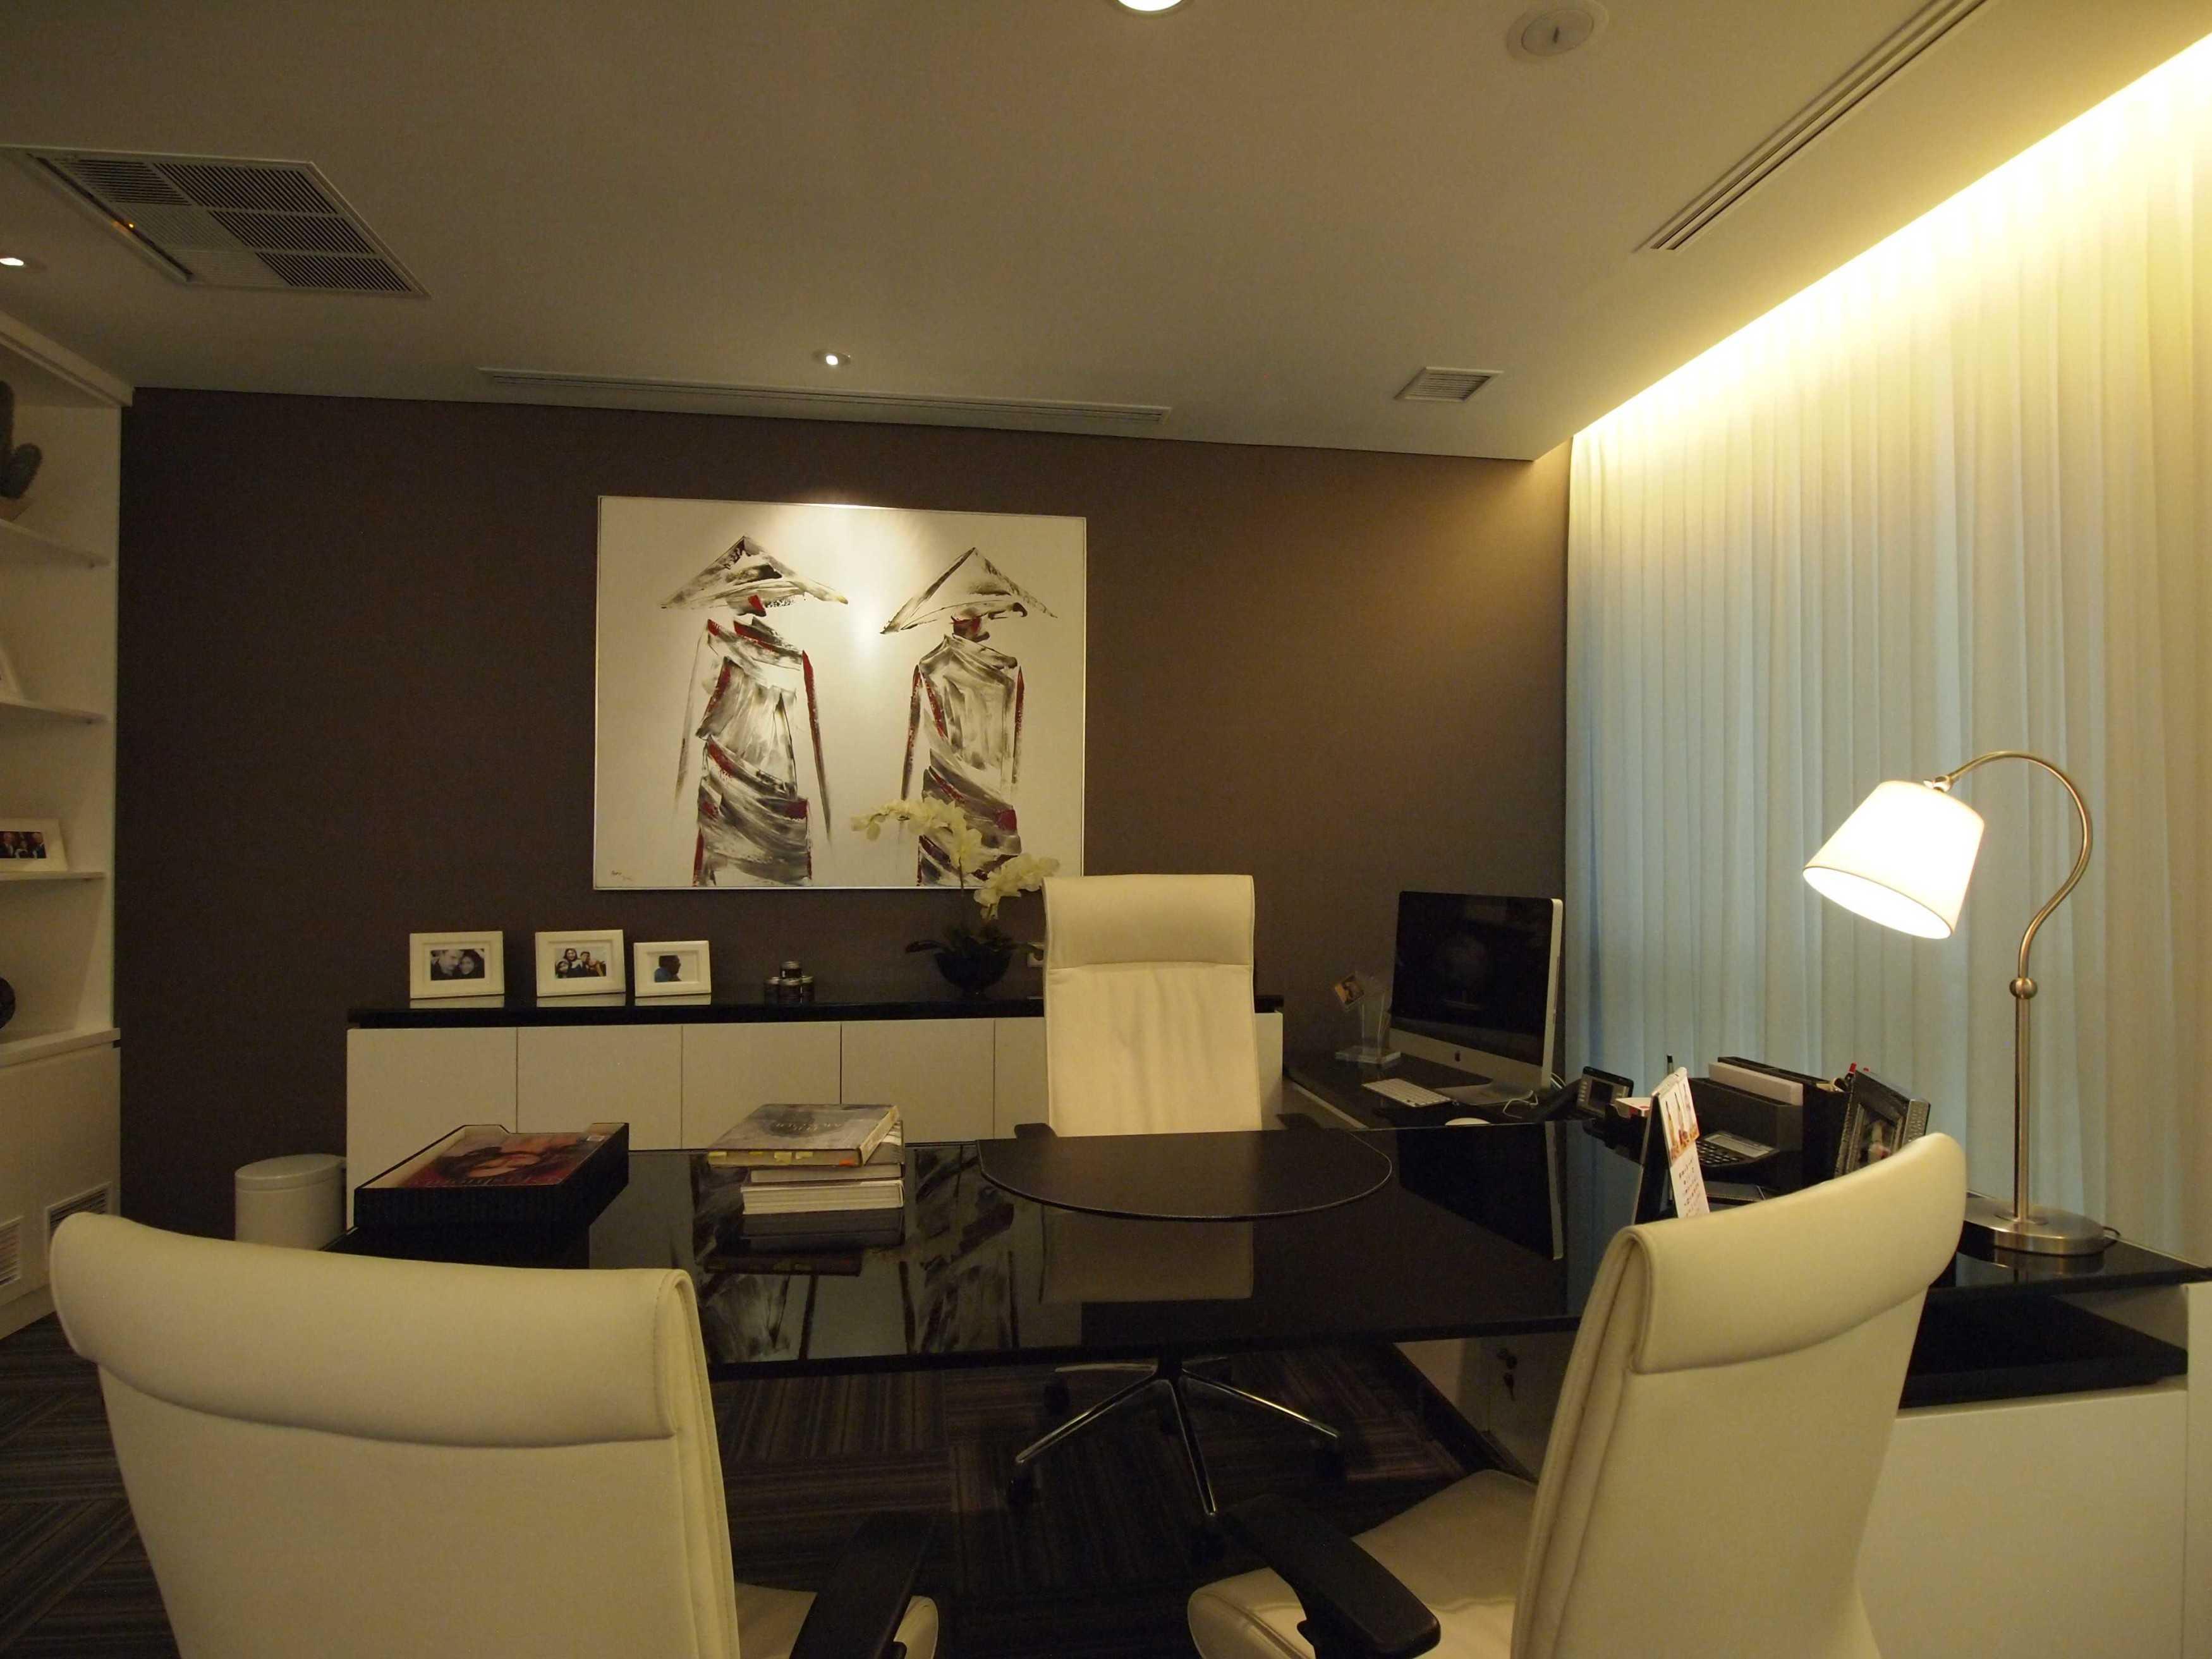 Pt. Garisprada Risjardson Karet Karet Office Room Modern <P>Directors Room</p> 25732